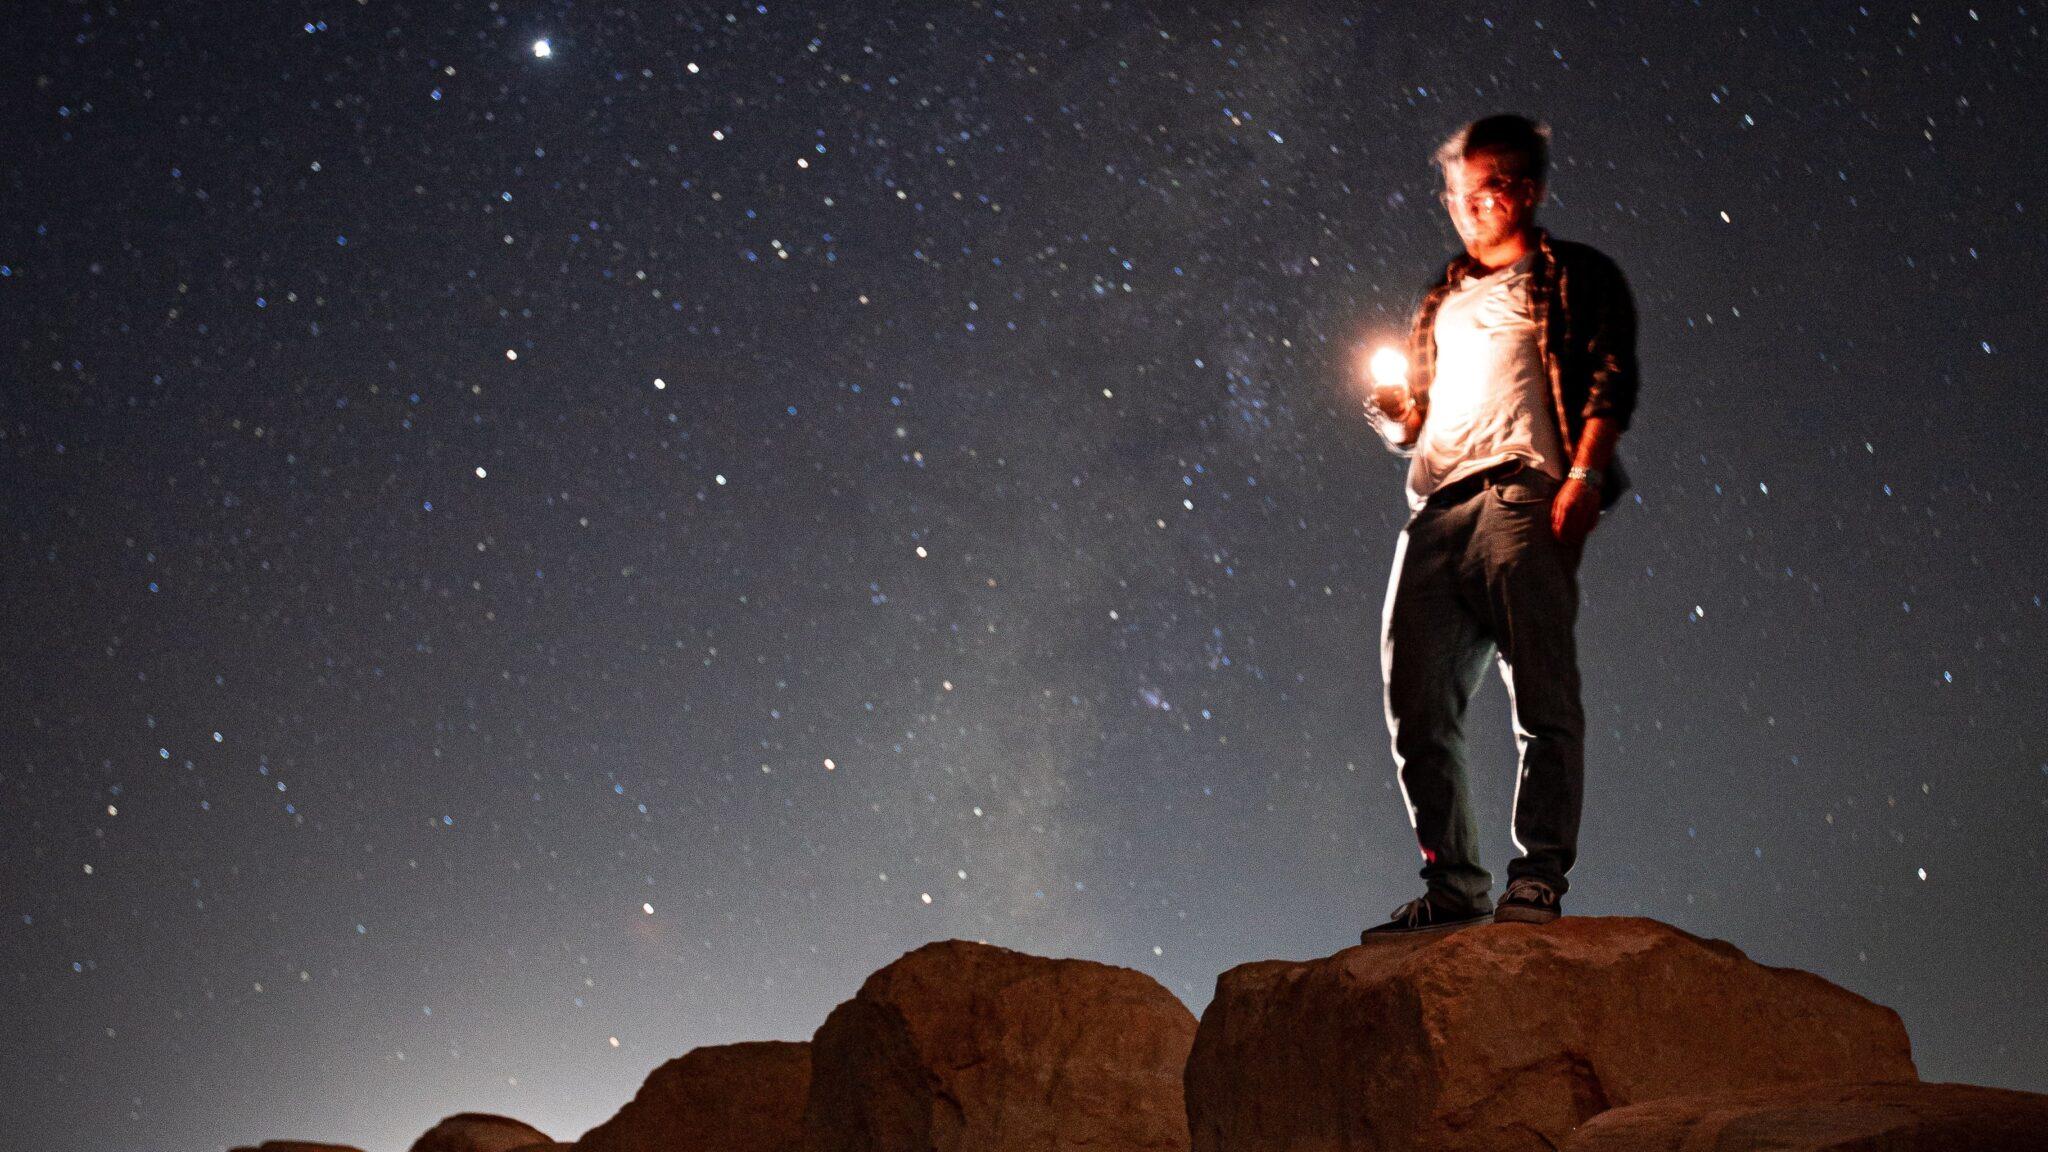 activar-flash-LED-Android-linterna-mejores-fotografias